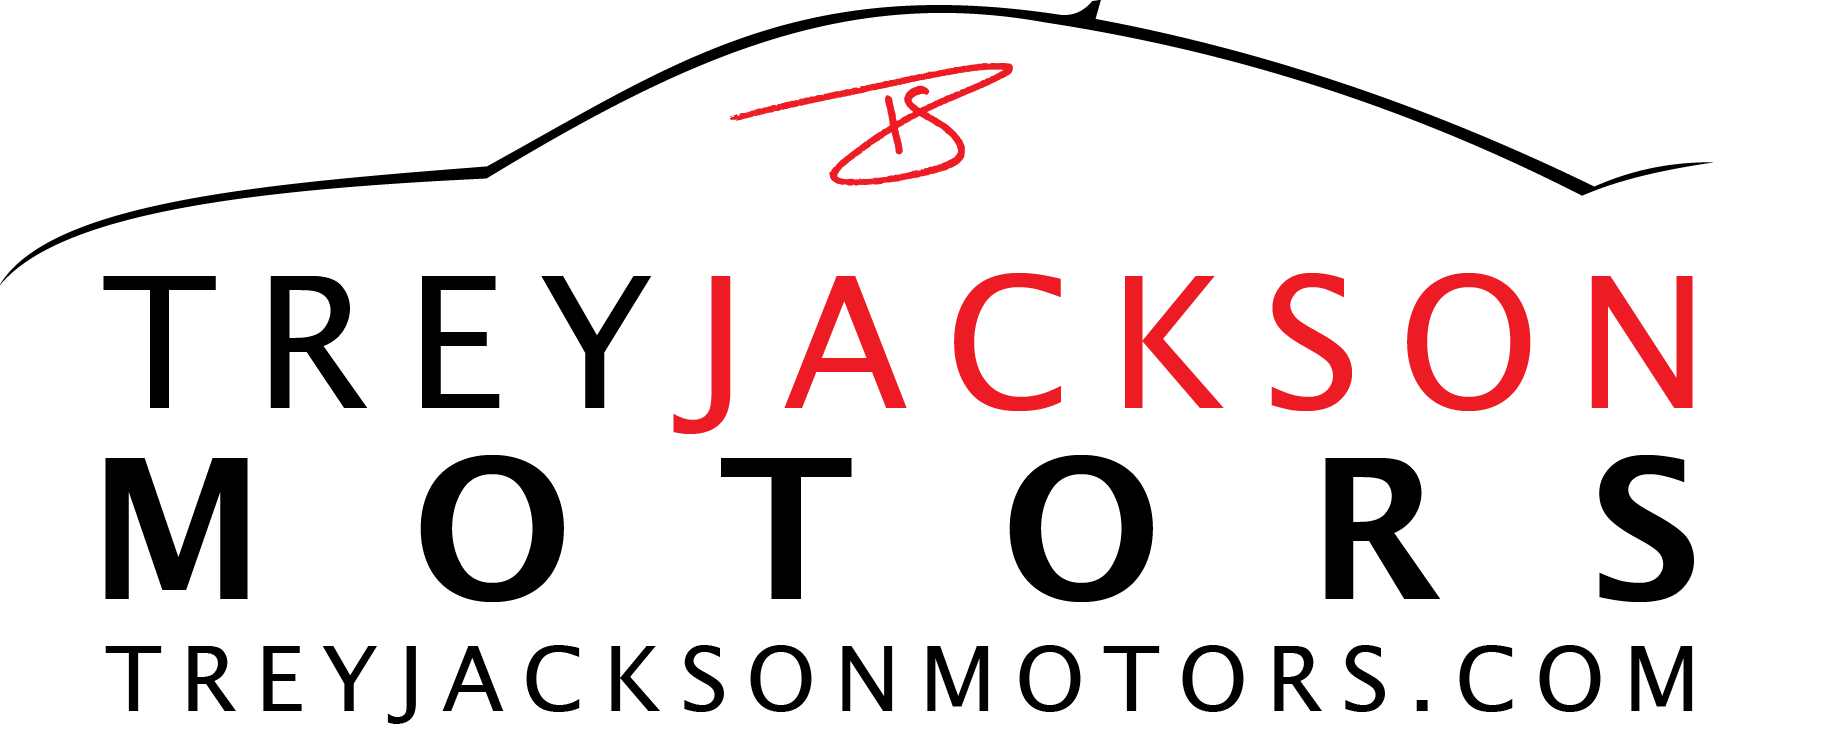 Trey Jackson Motors